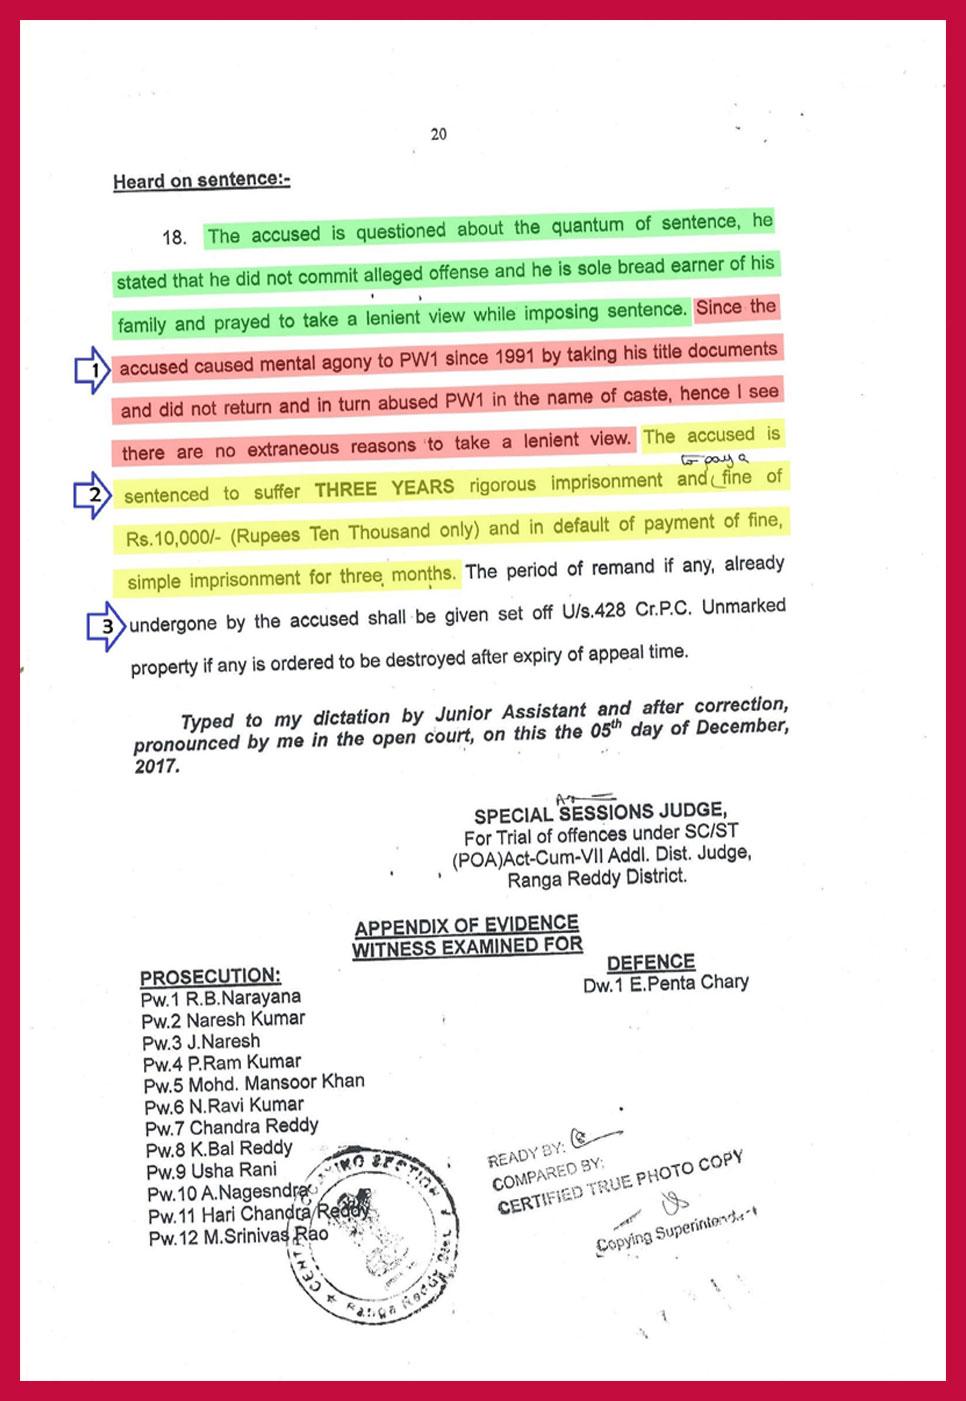 Ranga Reddy Court Judgment period 294 days-19